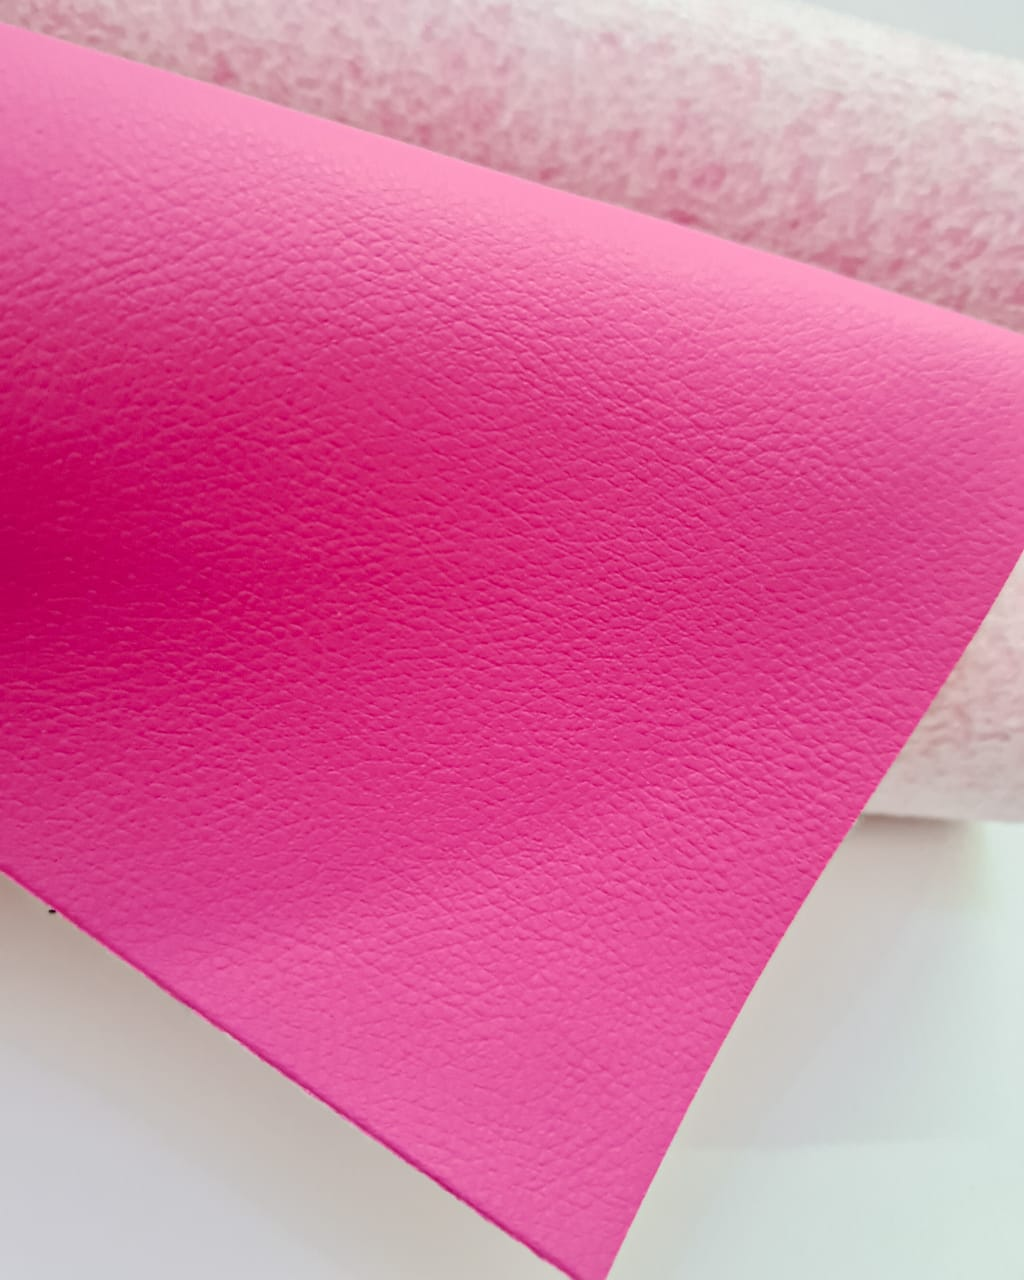 Sintético Bidim Pink 1.5 com Manta